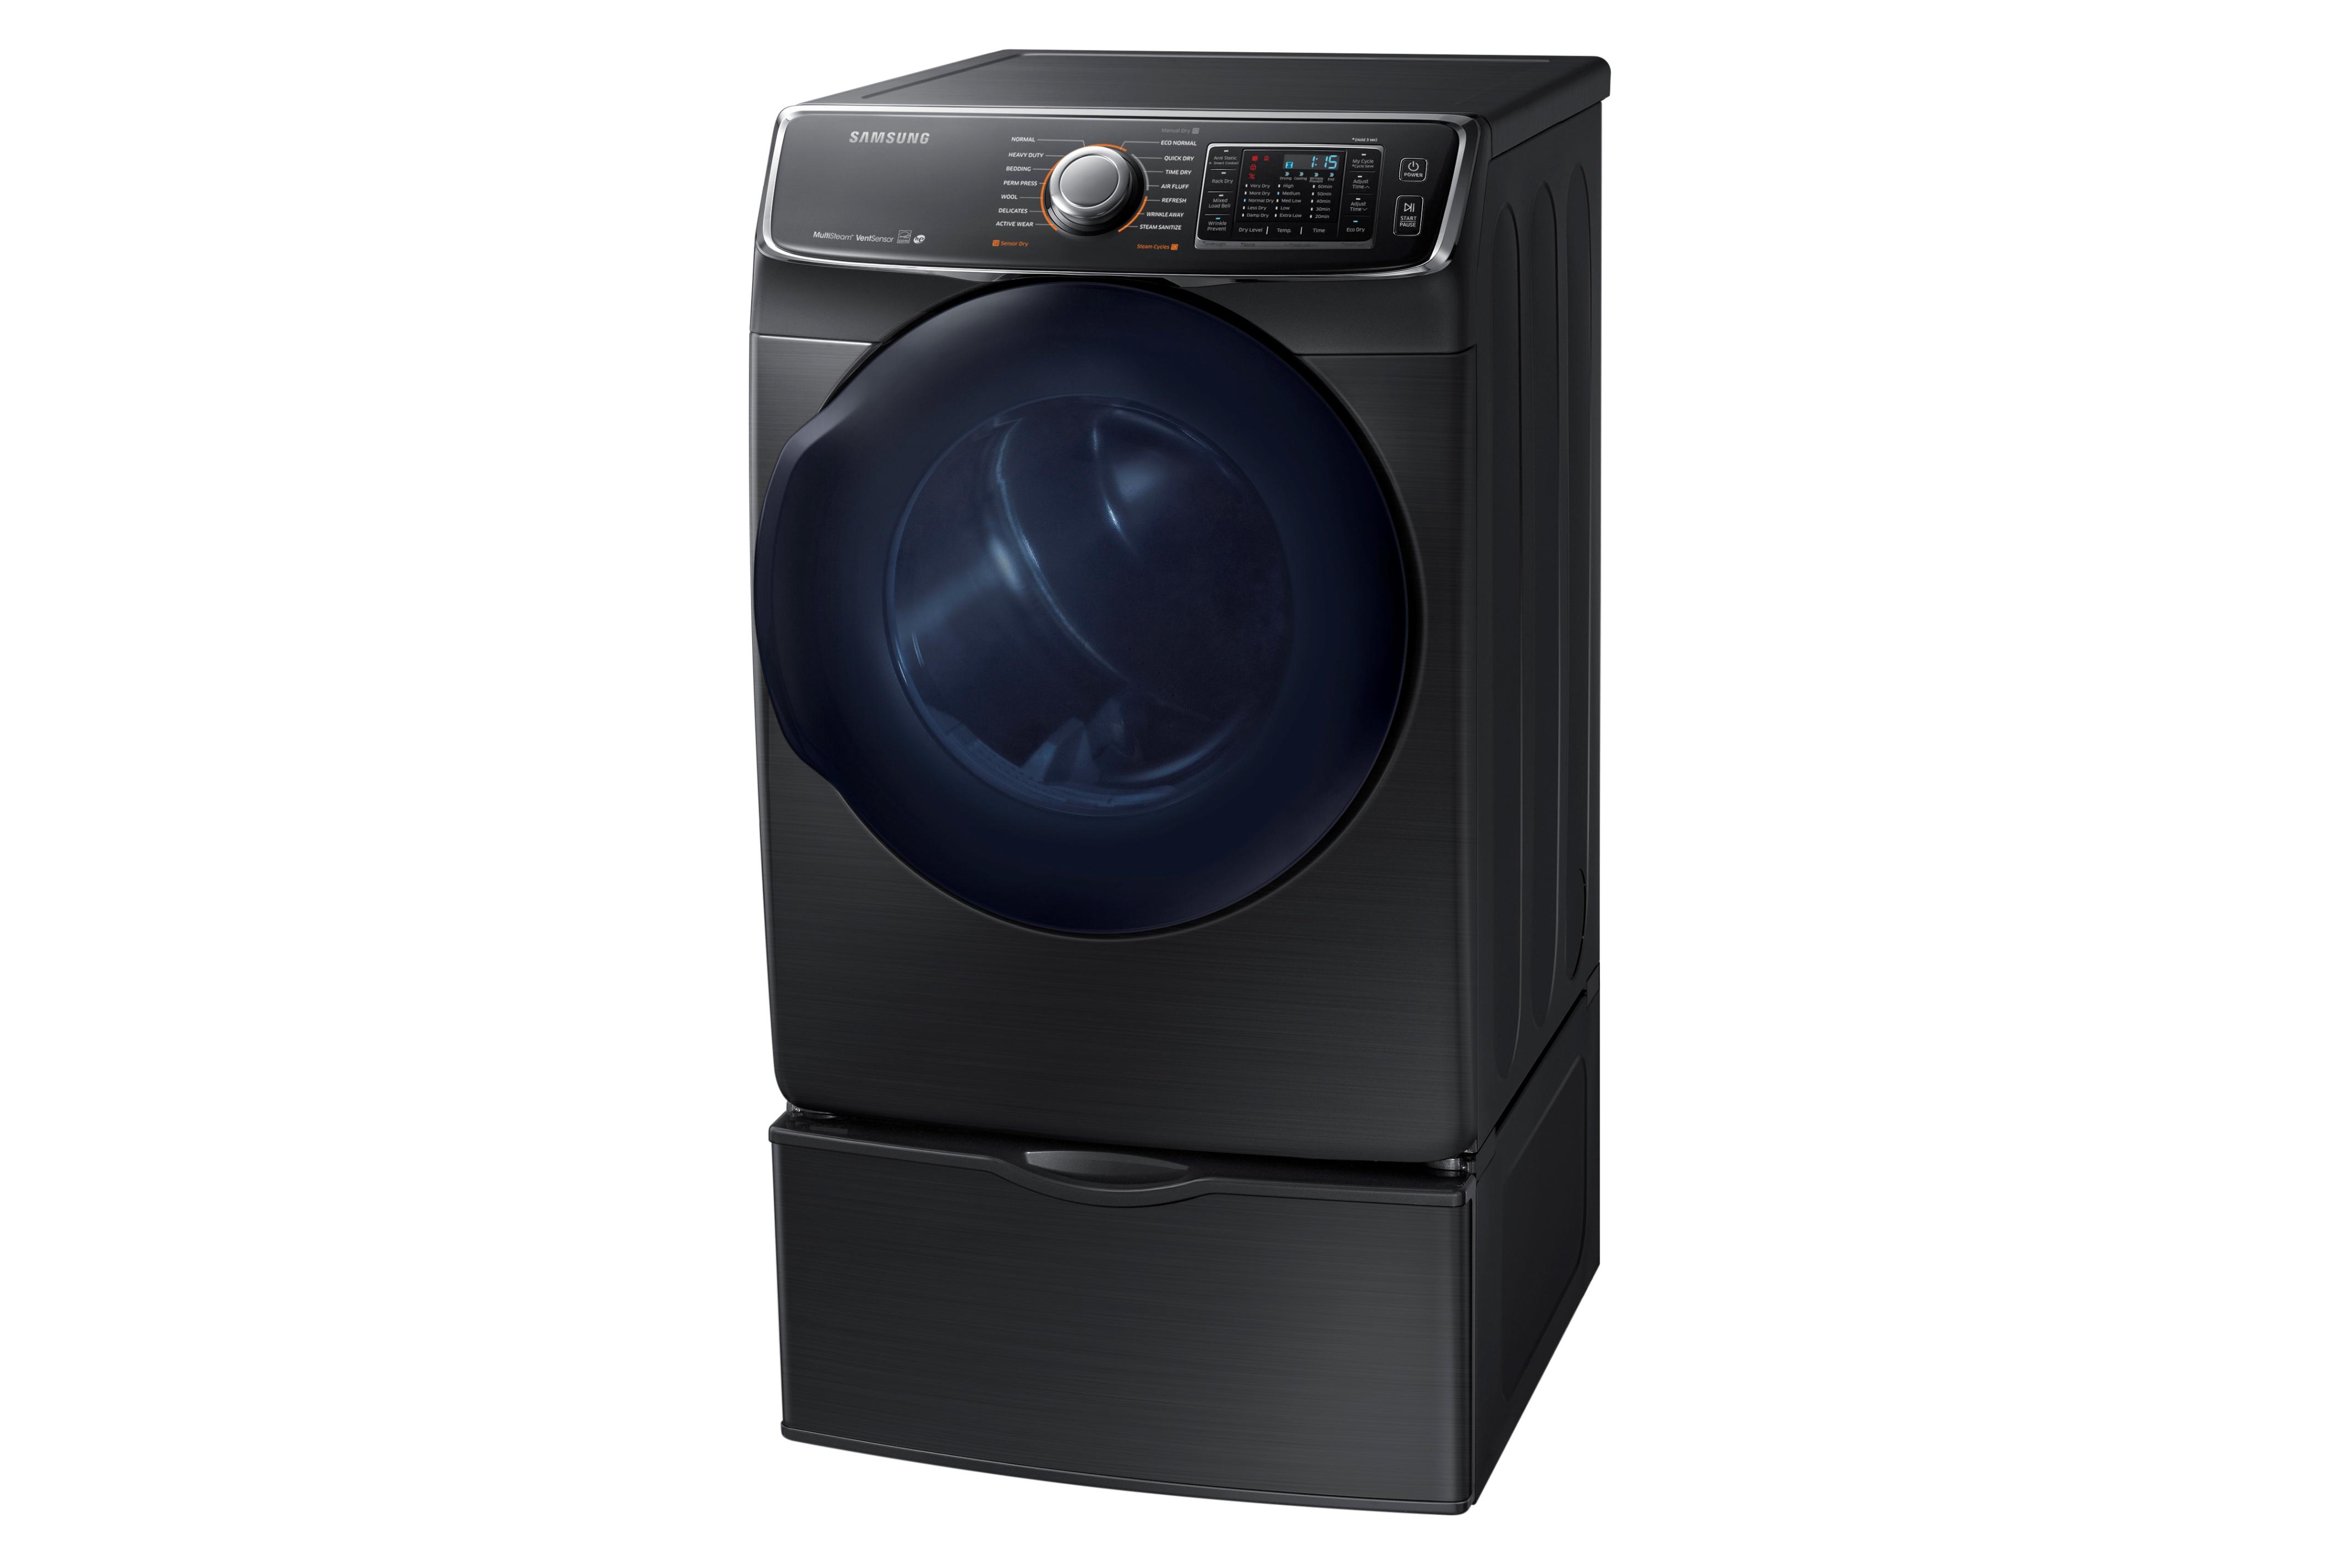 Samsung DV50K7500EV 7.5 cu. ft. Capacity Electric Dryer Black Stainless Steel